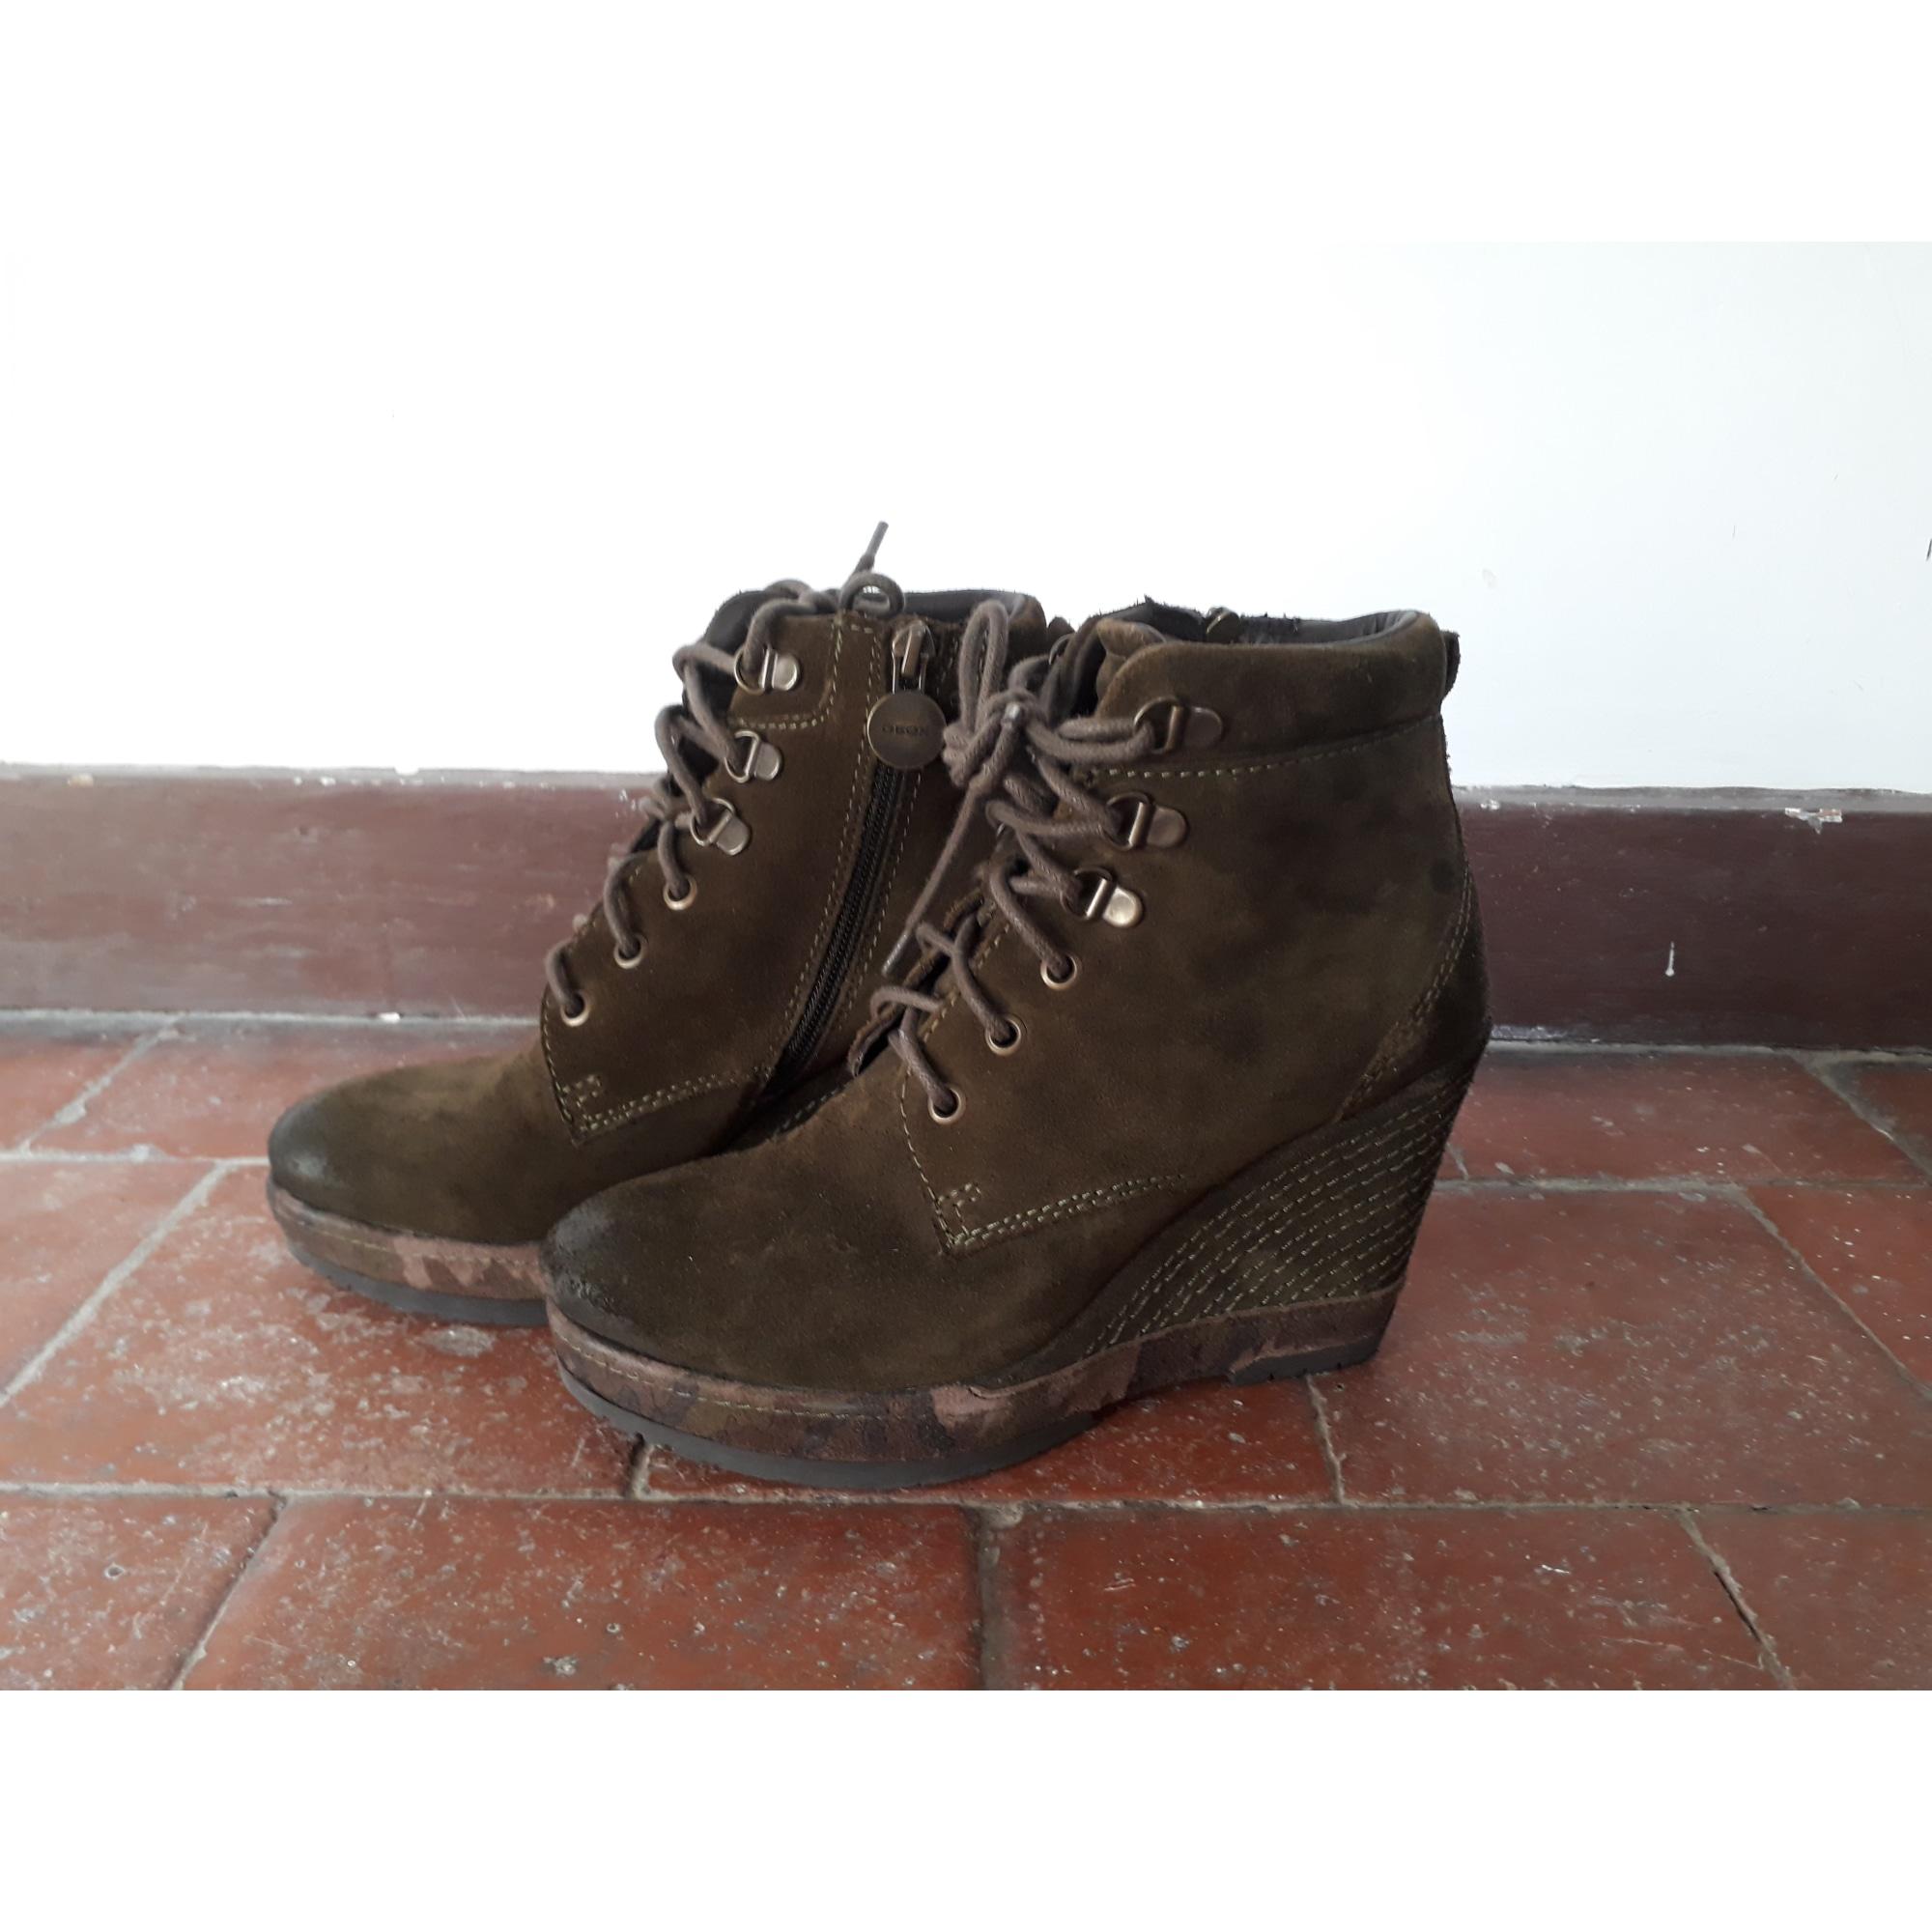 bf55d11740b59f Bottines & low boots à compensés GEOX 37 kaki - 6577142